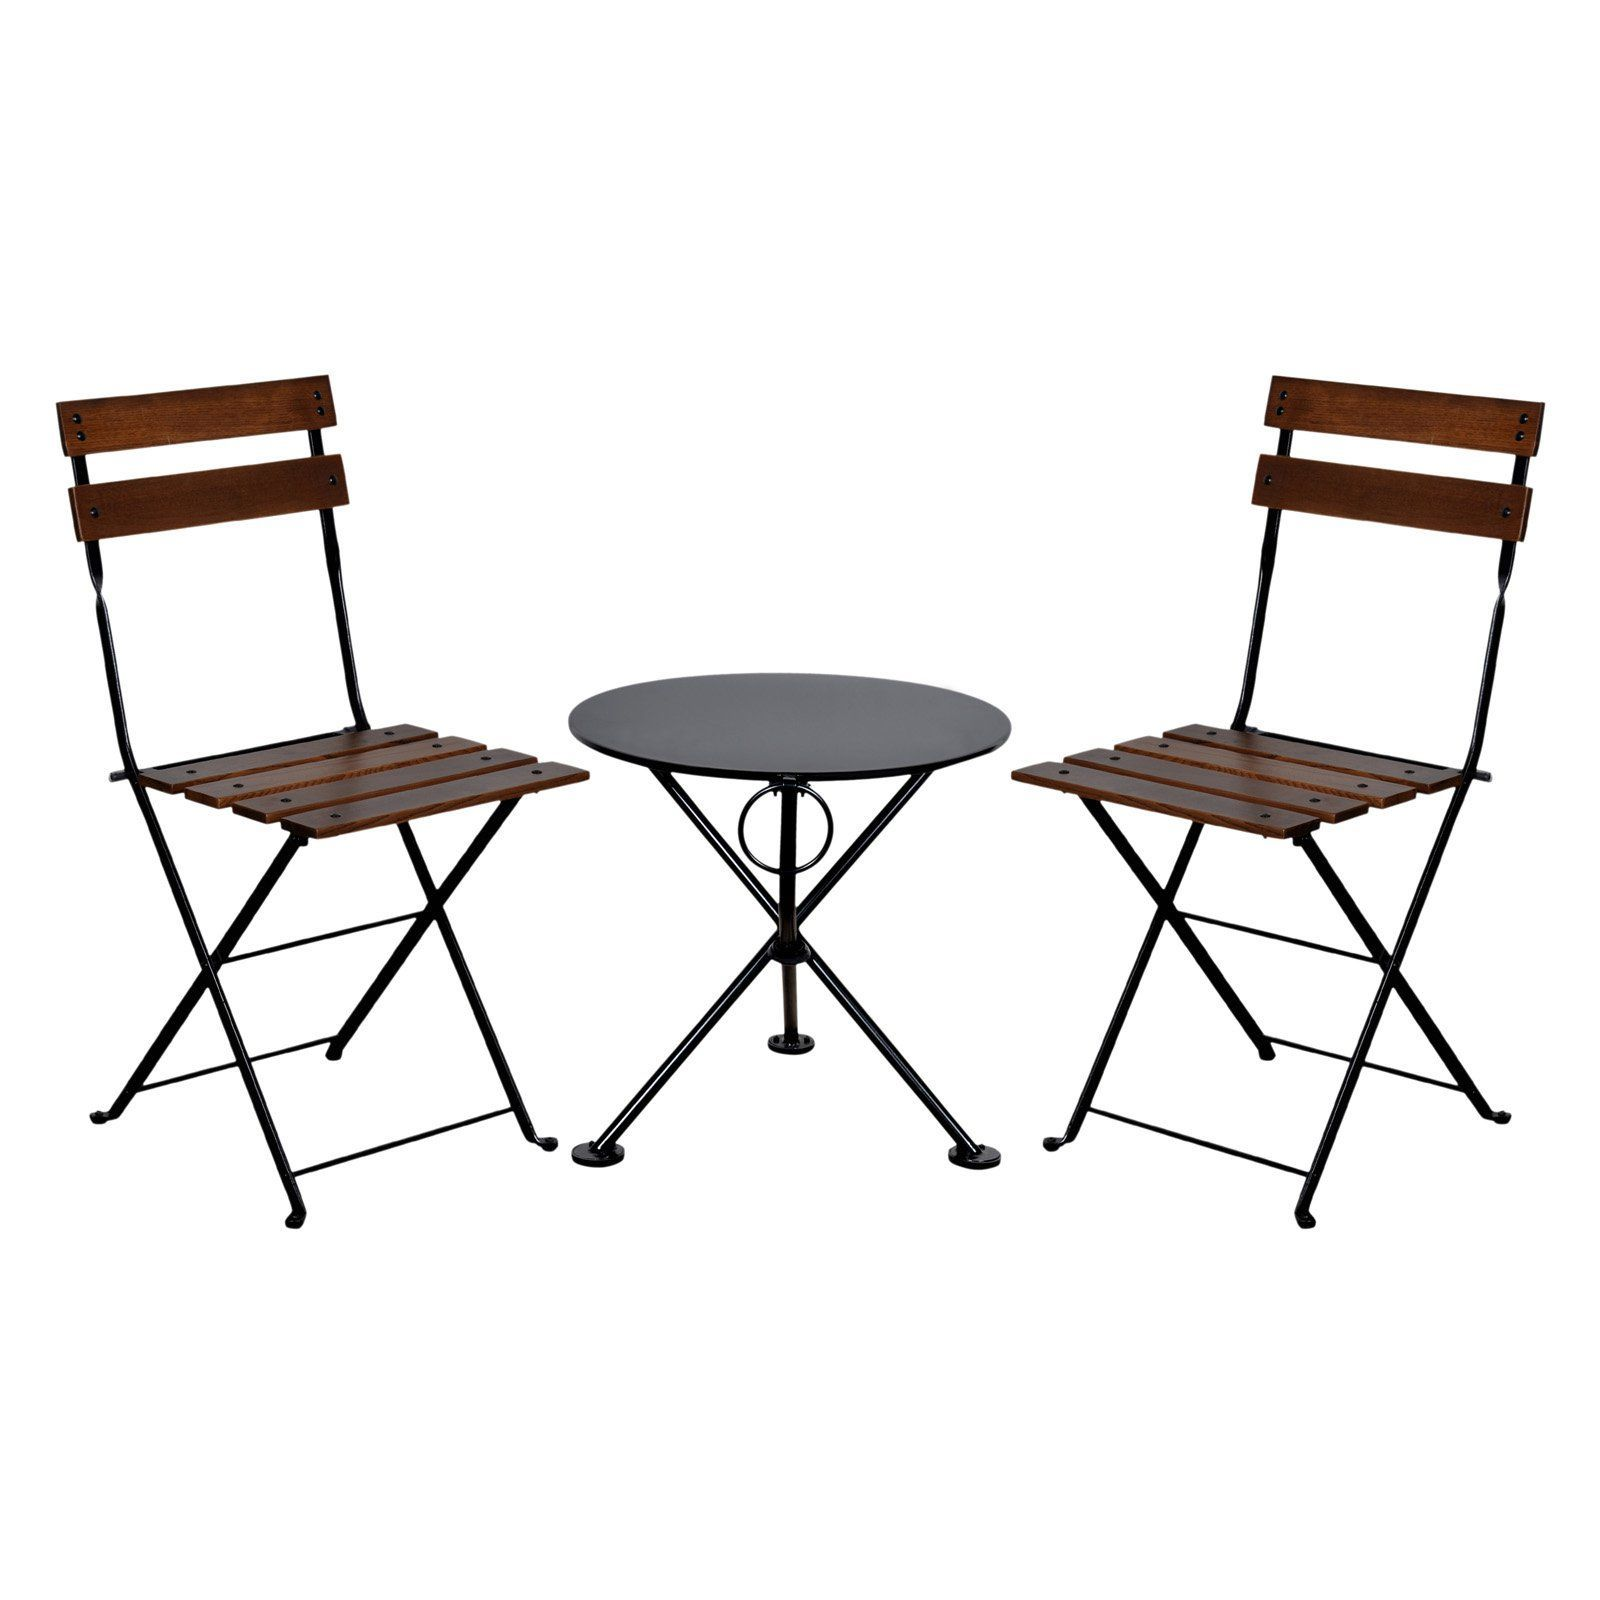 Outdoor Furniture Designhouse French Cafe Bistro Chestnut Wood 3 Piece Round Metal Folding Patio Set